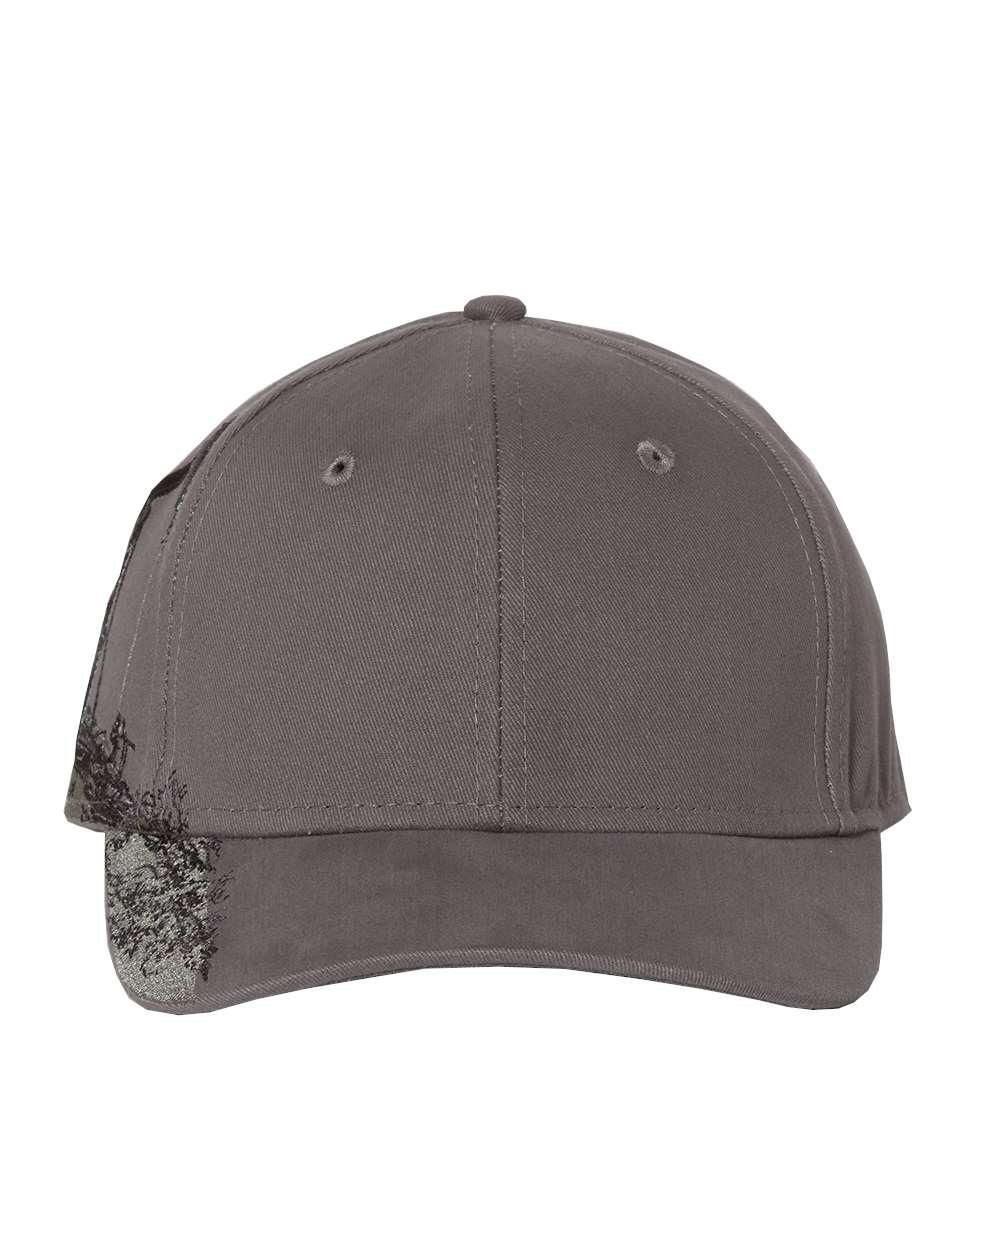 DRI DUCK - Oil Field Cap - 3330 - Grey - One Size